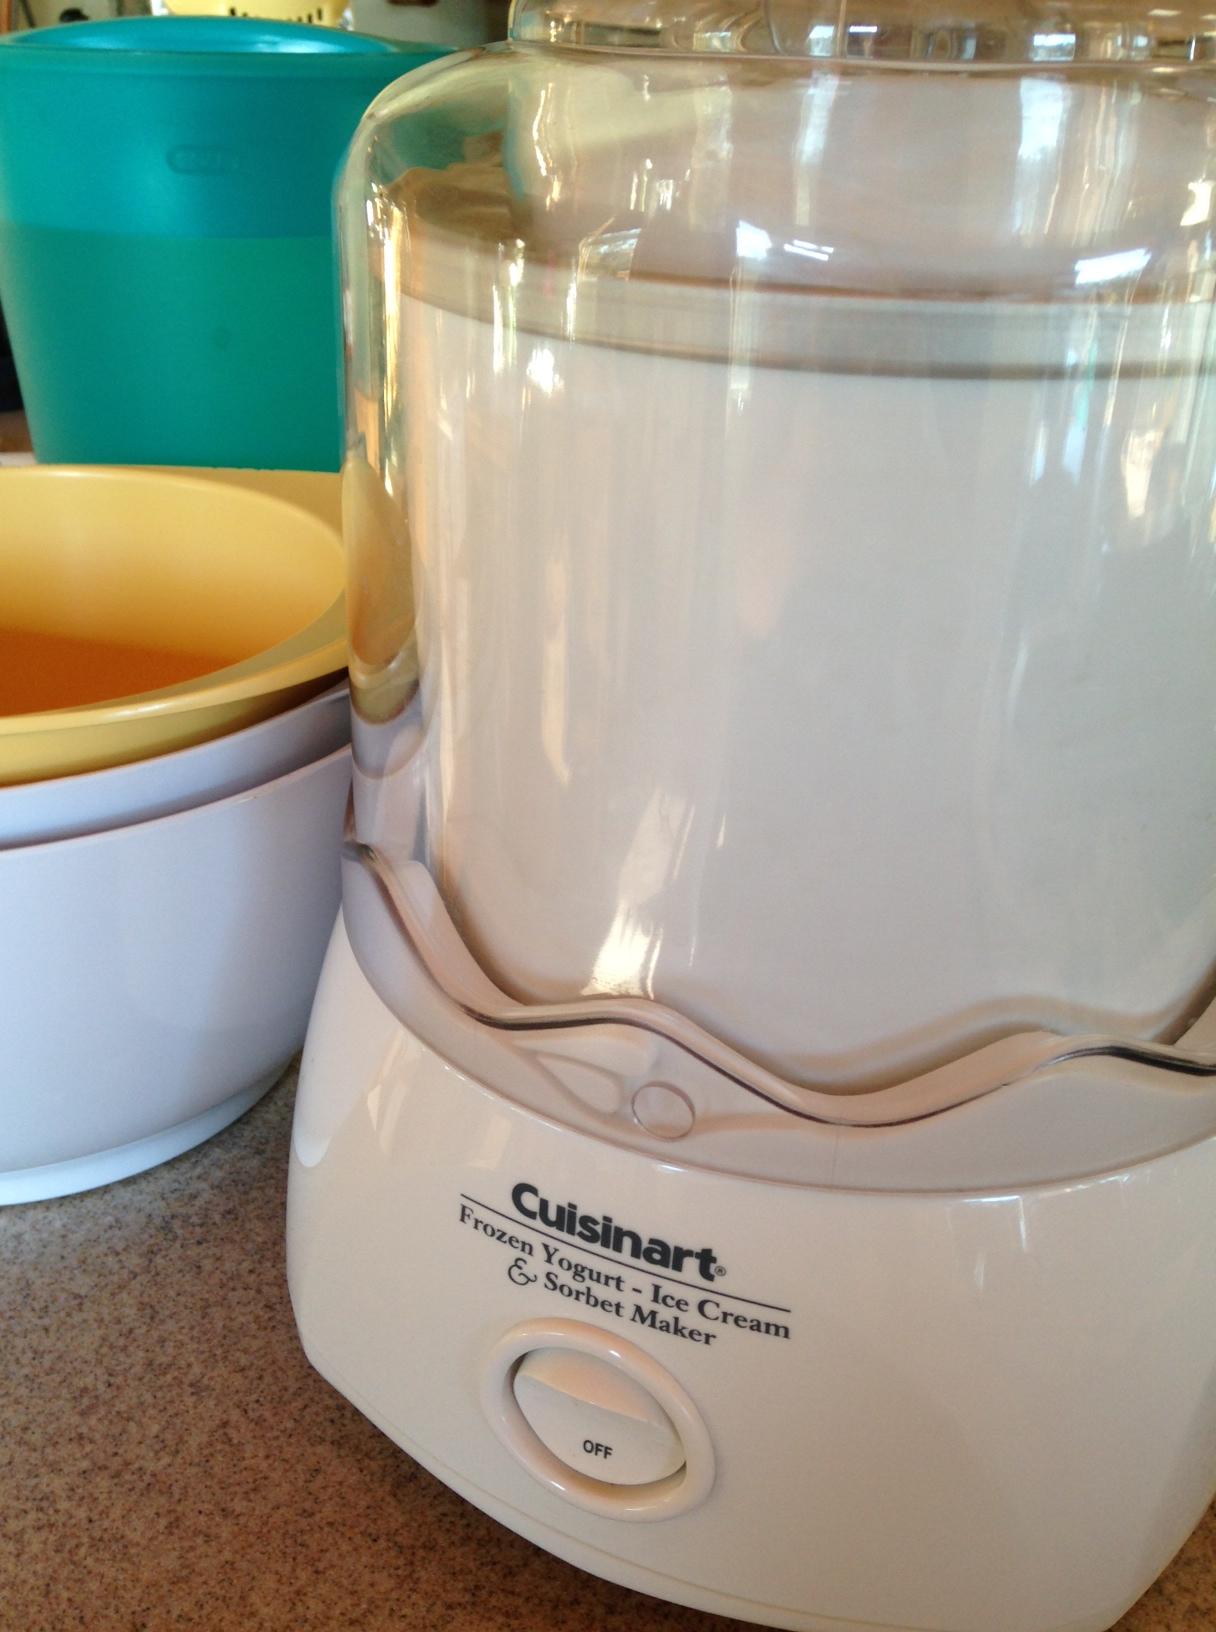 Counter Top Ice Cream Maker Recipes : Cuisinart Countertop Super-easy Ice Cream Maker. No ice or rock salt ...